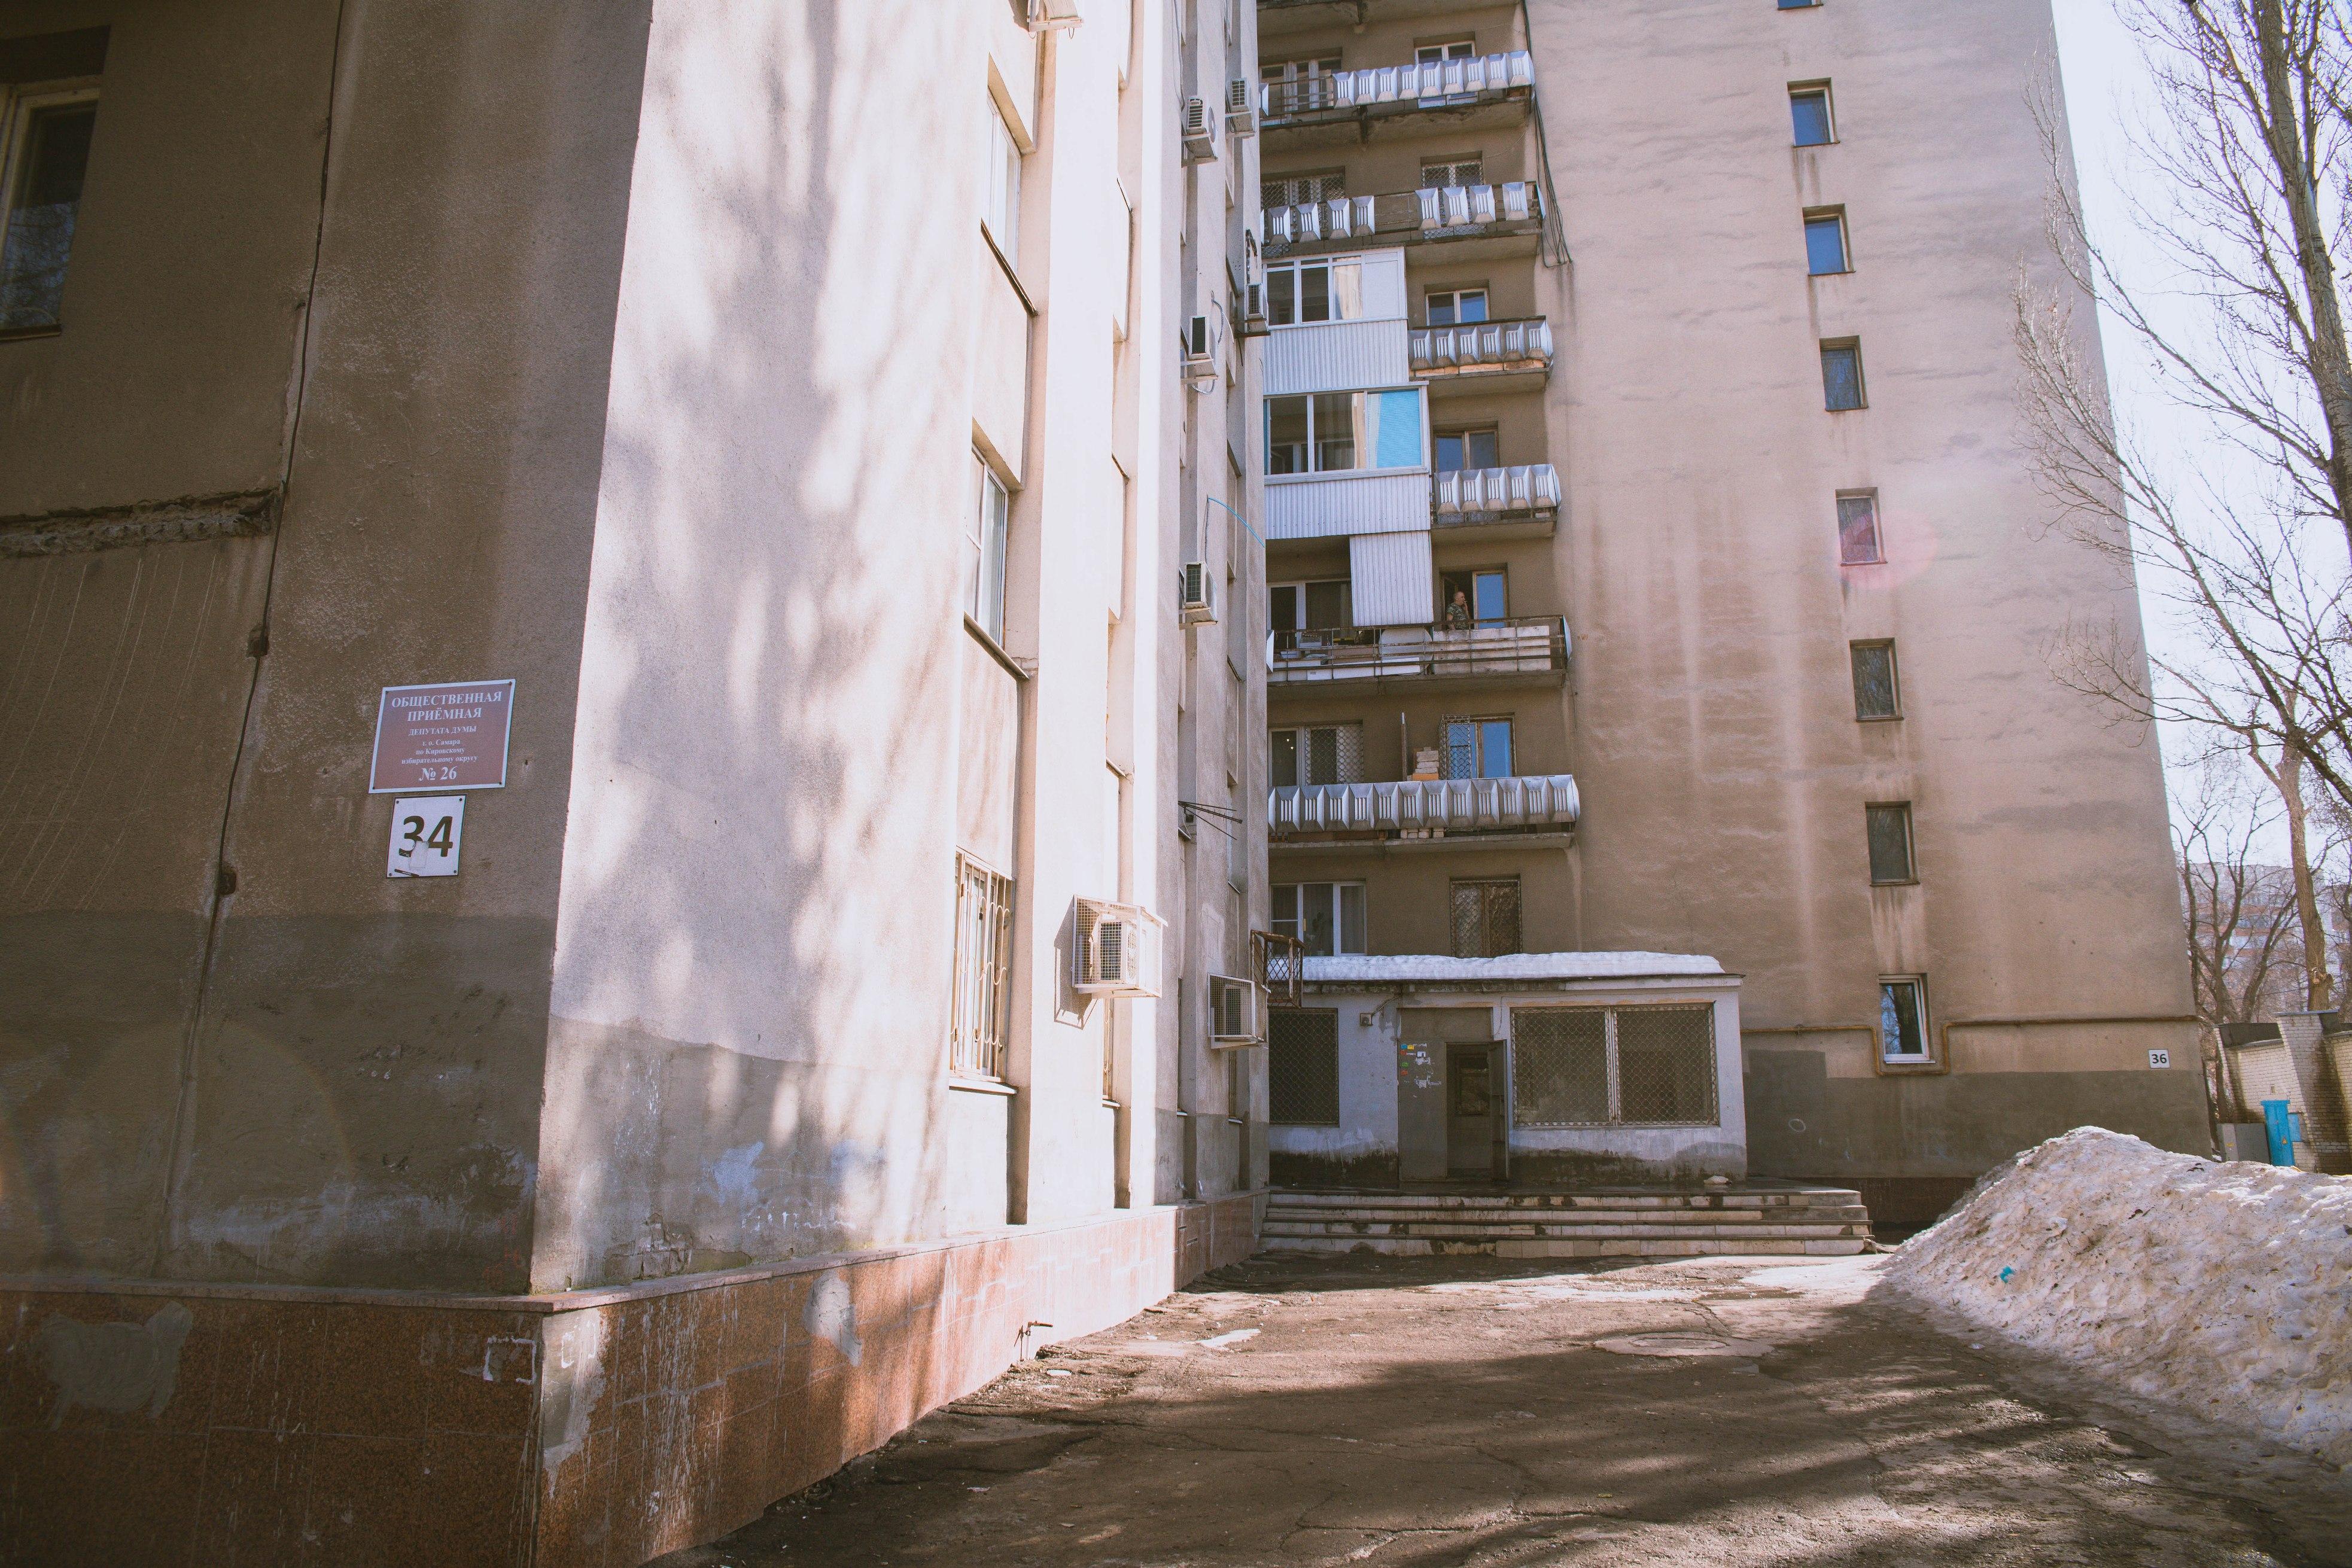 Гостиница и общежитие металлургического завода